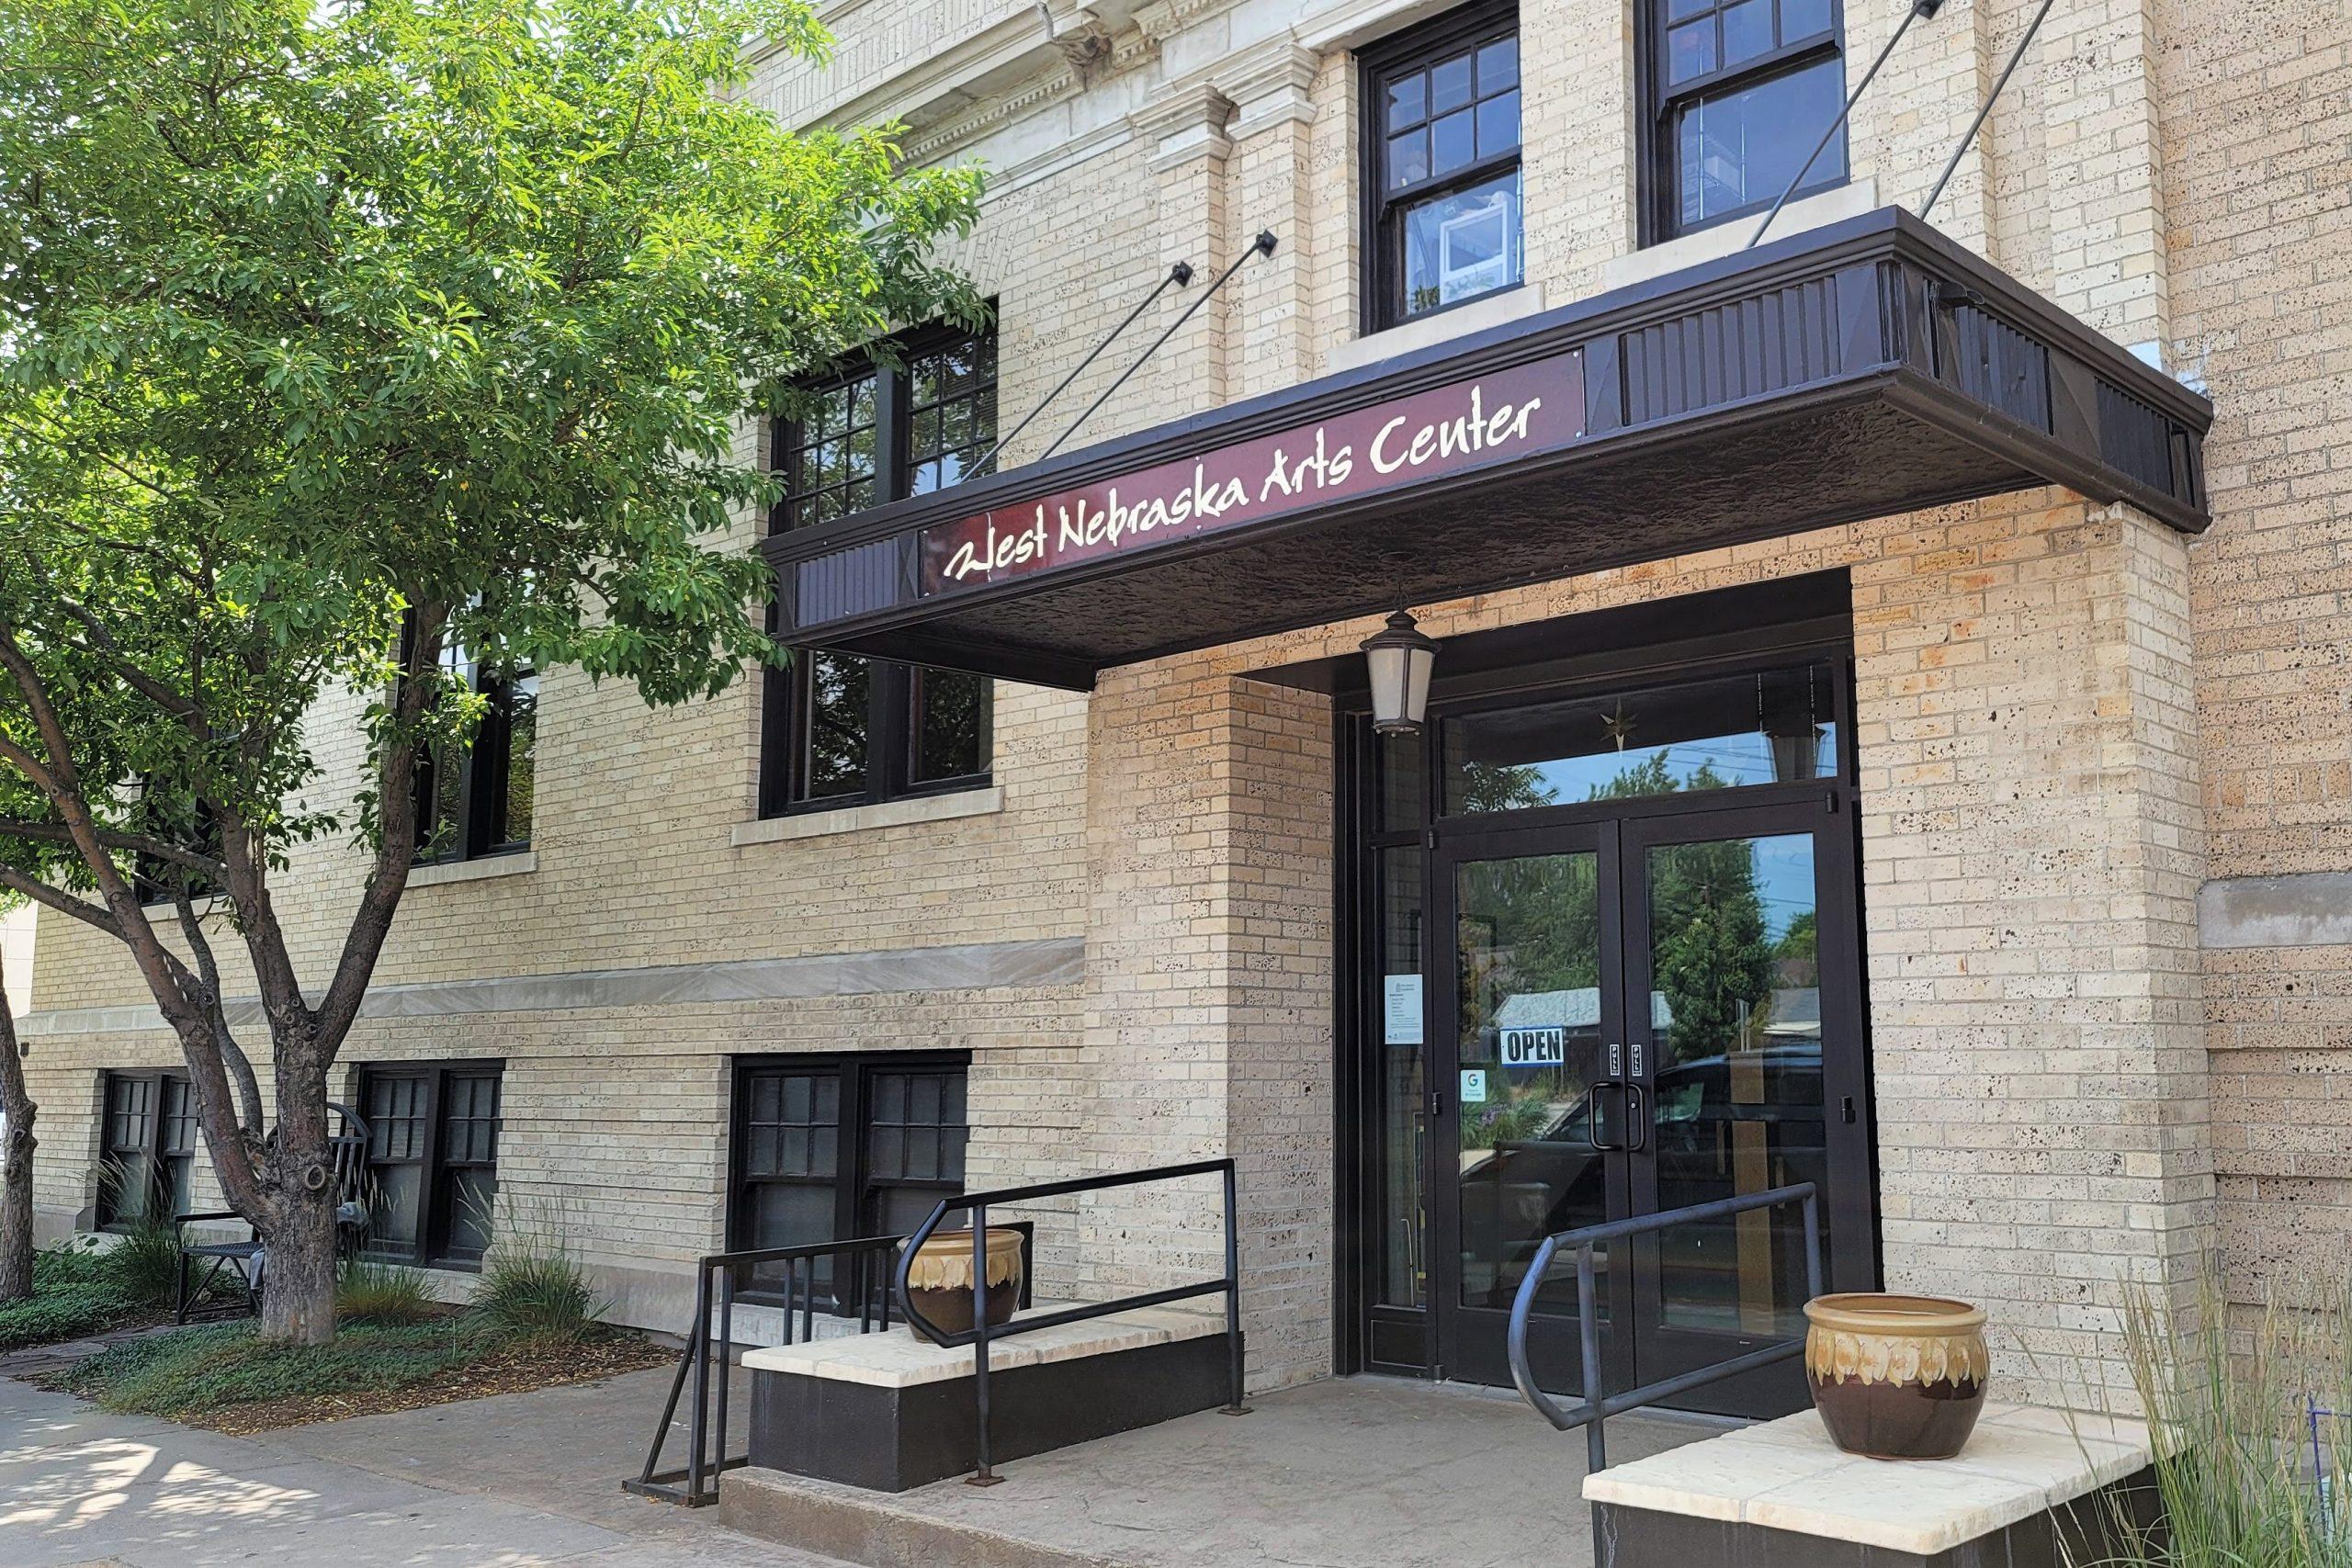 west-nebraska-arts-center